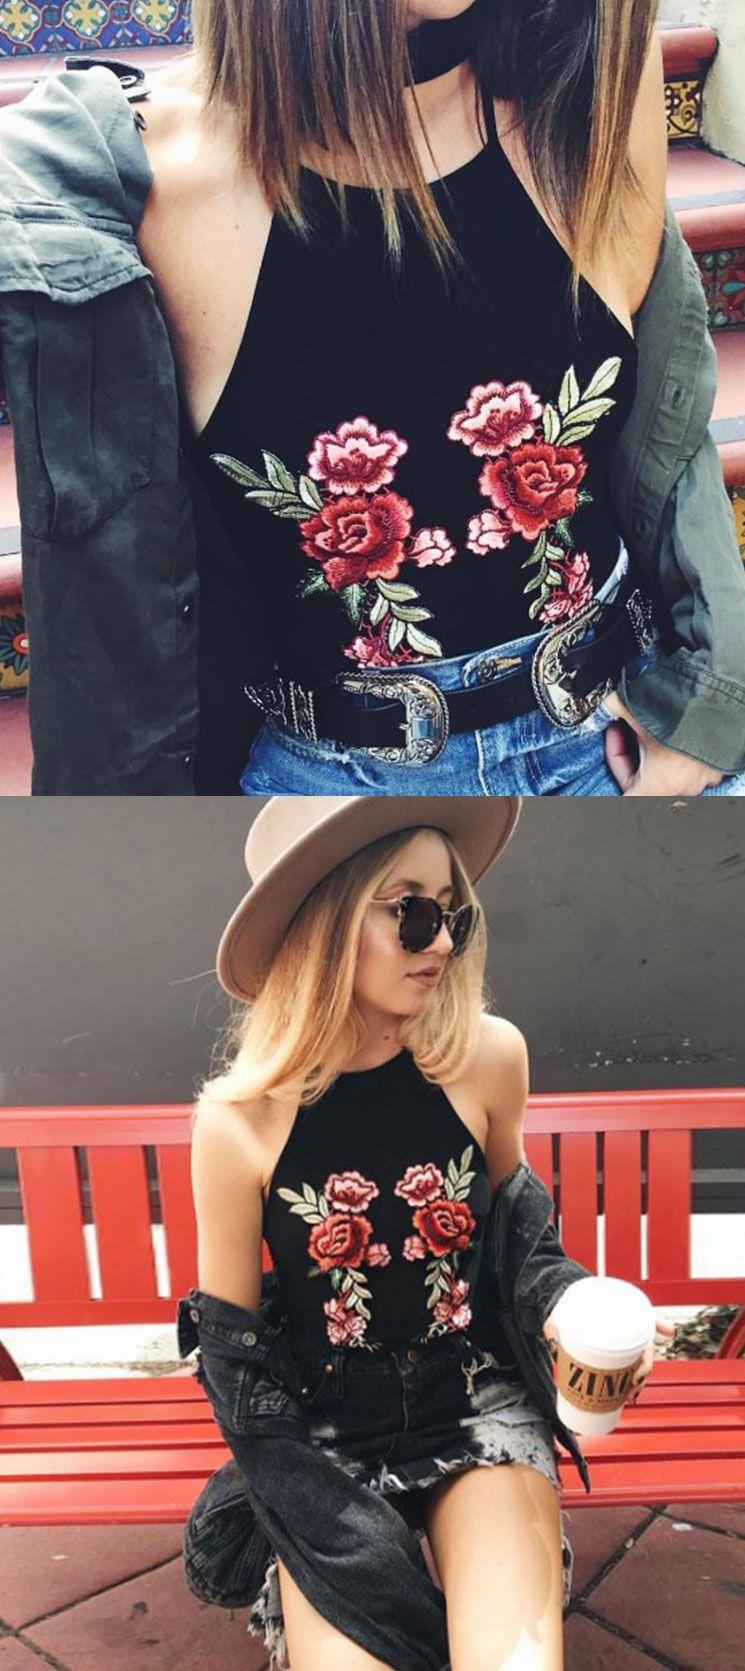 Rose Halter Embroidery Black Scrop Tops ,tank tops,grils tank tops,crop tops,girls tank tops,fashion teenage,summer fashion,fashion style,spring fashion,fashion 2017,women fashion,shirts, for teenage girls